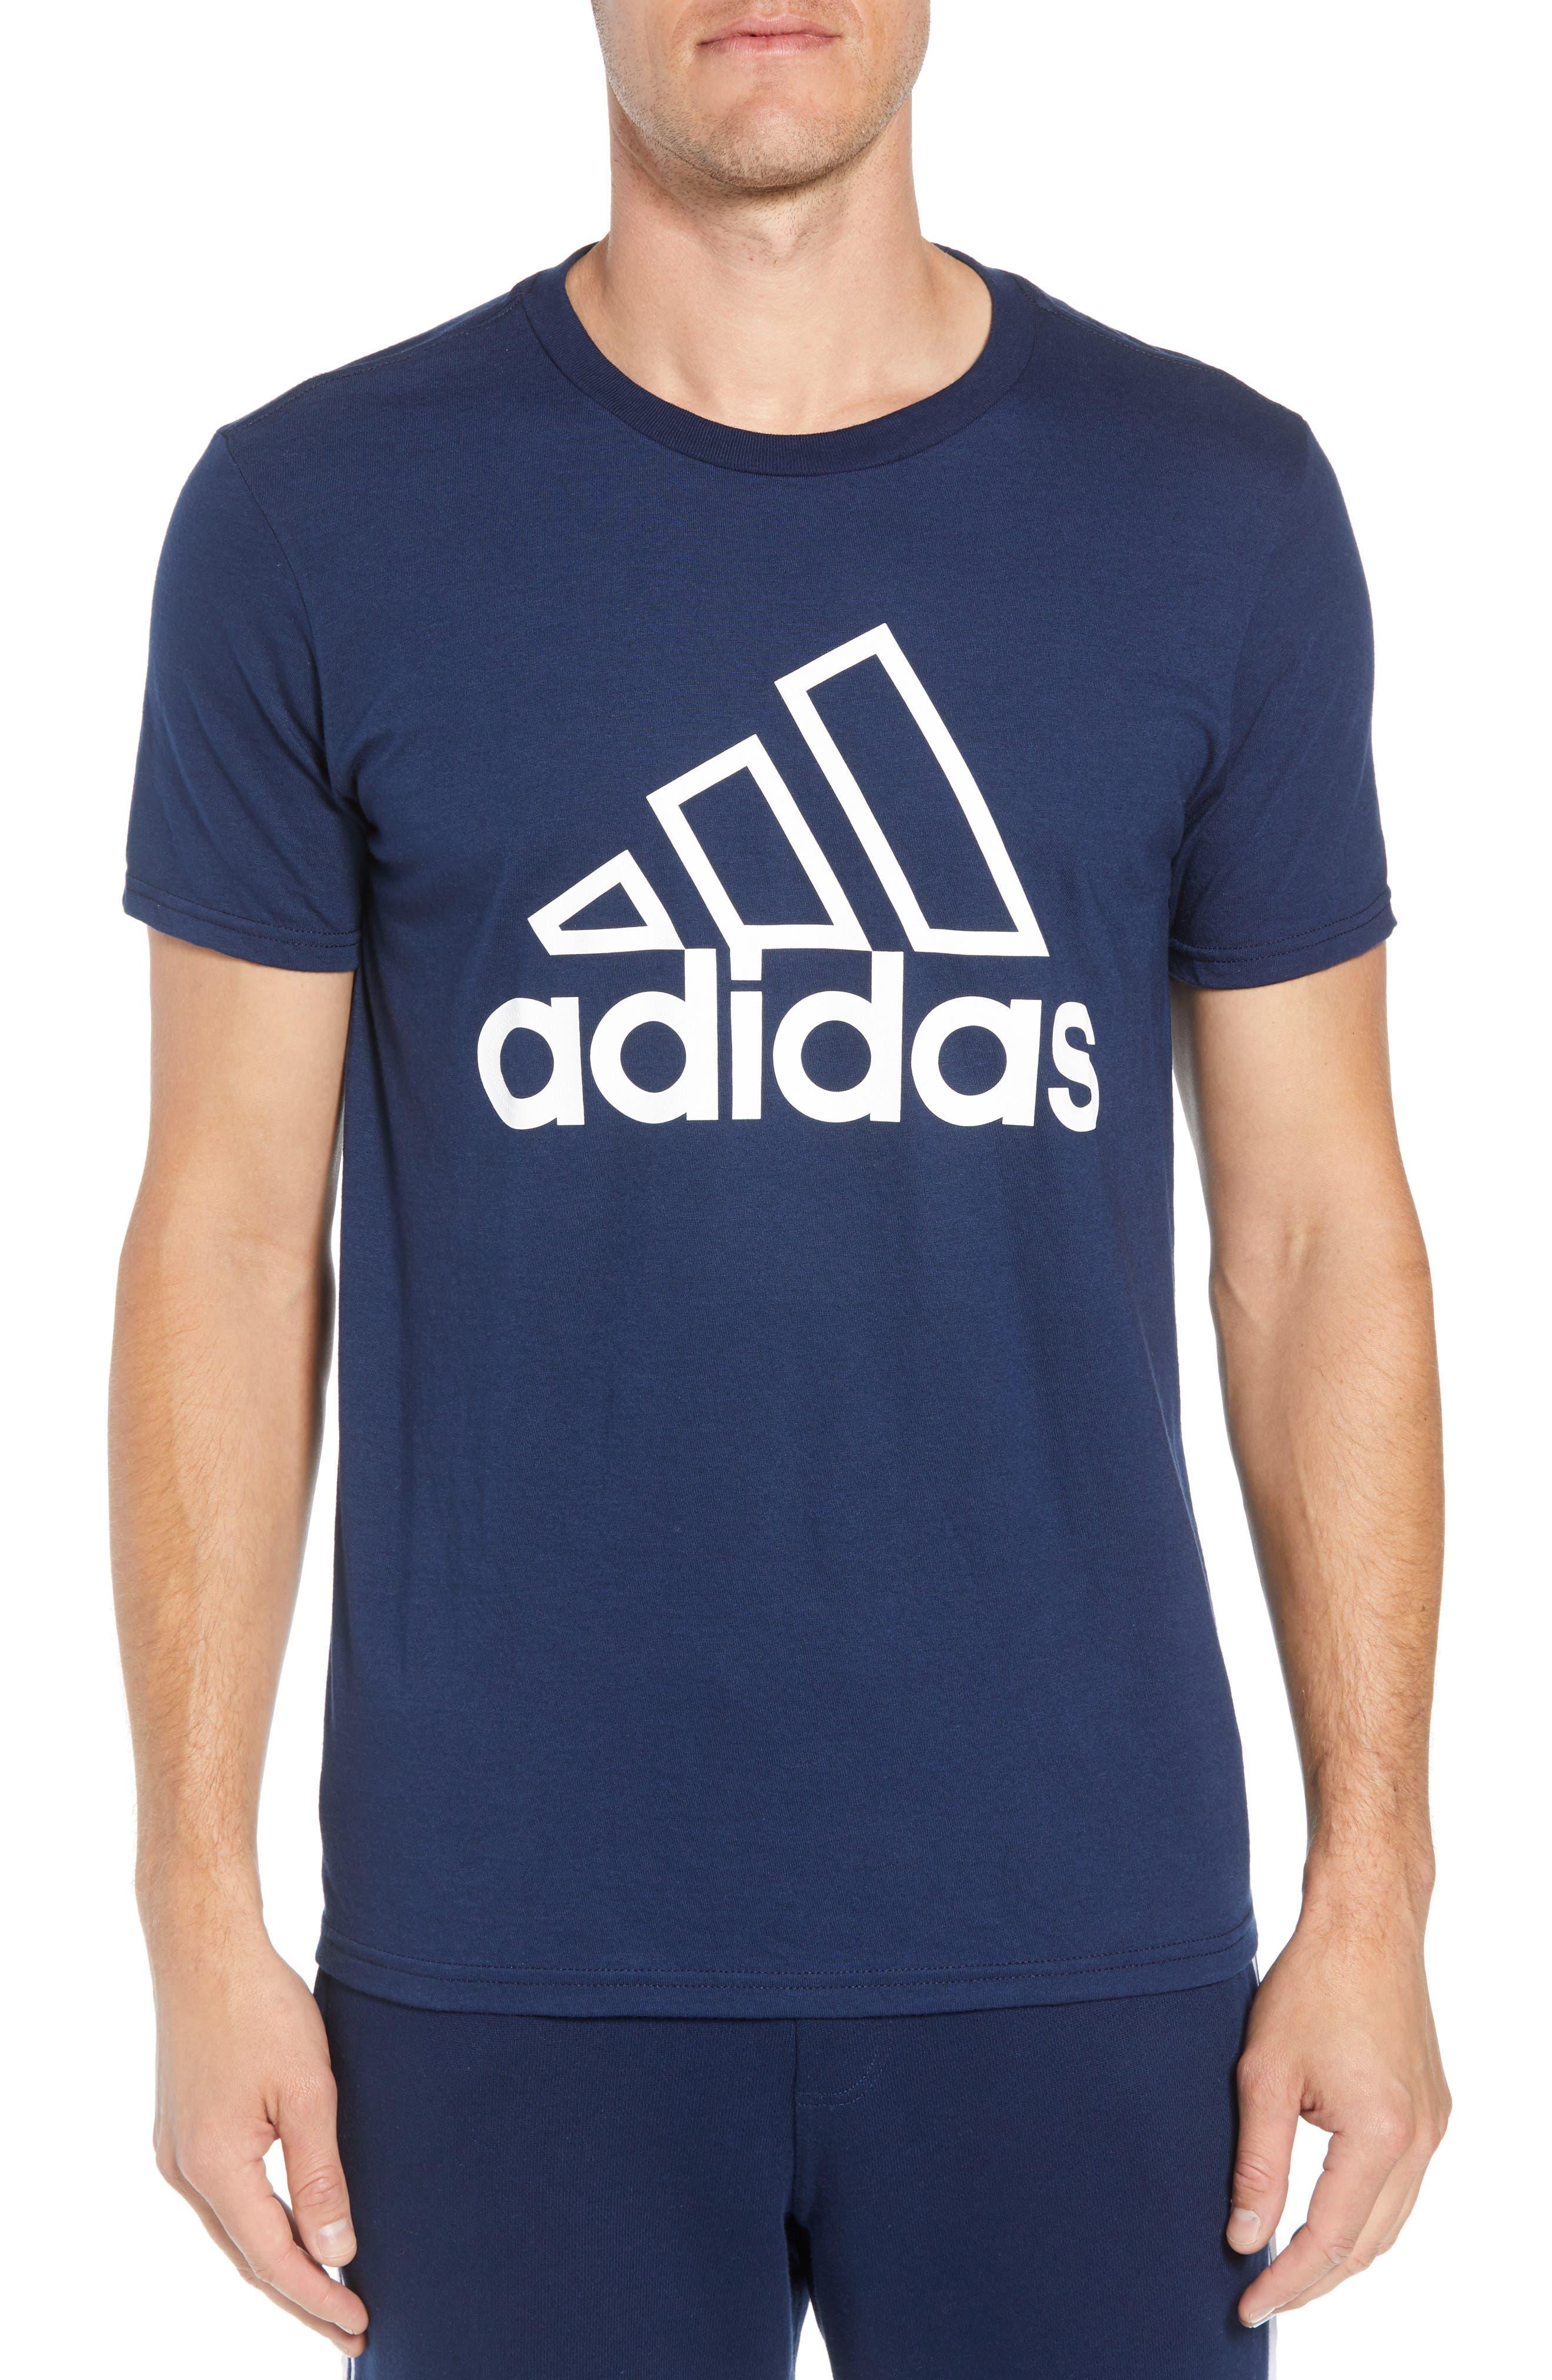 blu adidas per gli uomini: activewear, scarpe & orologi nordstrom